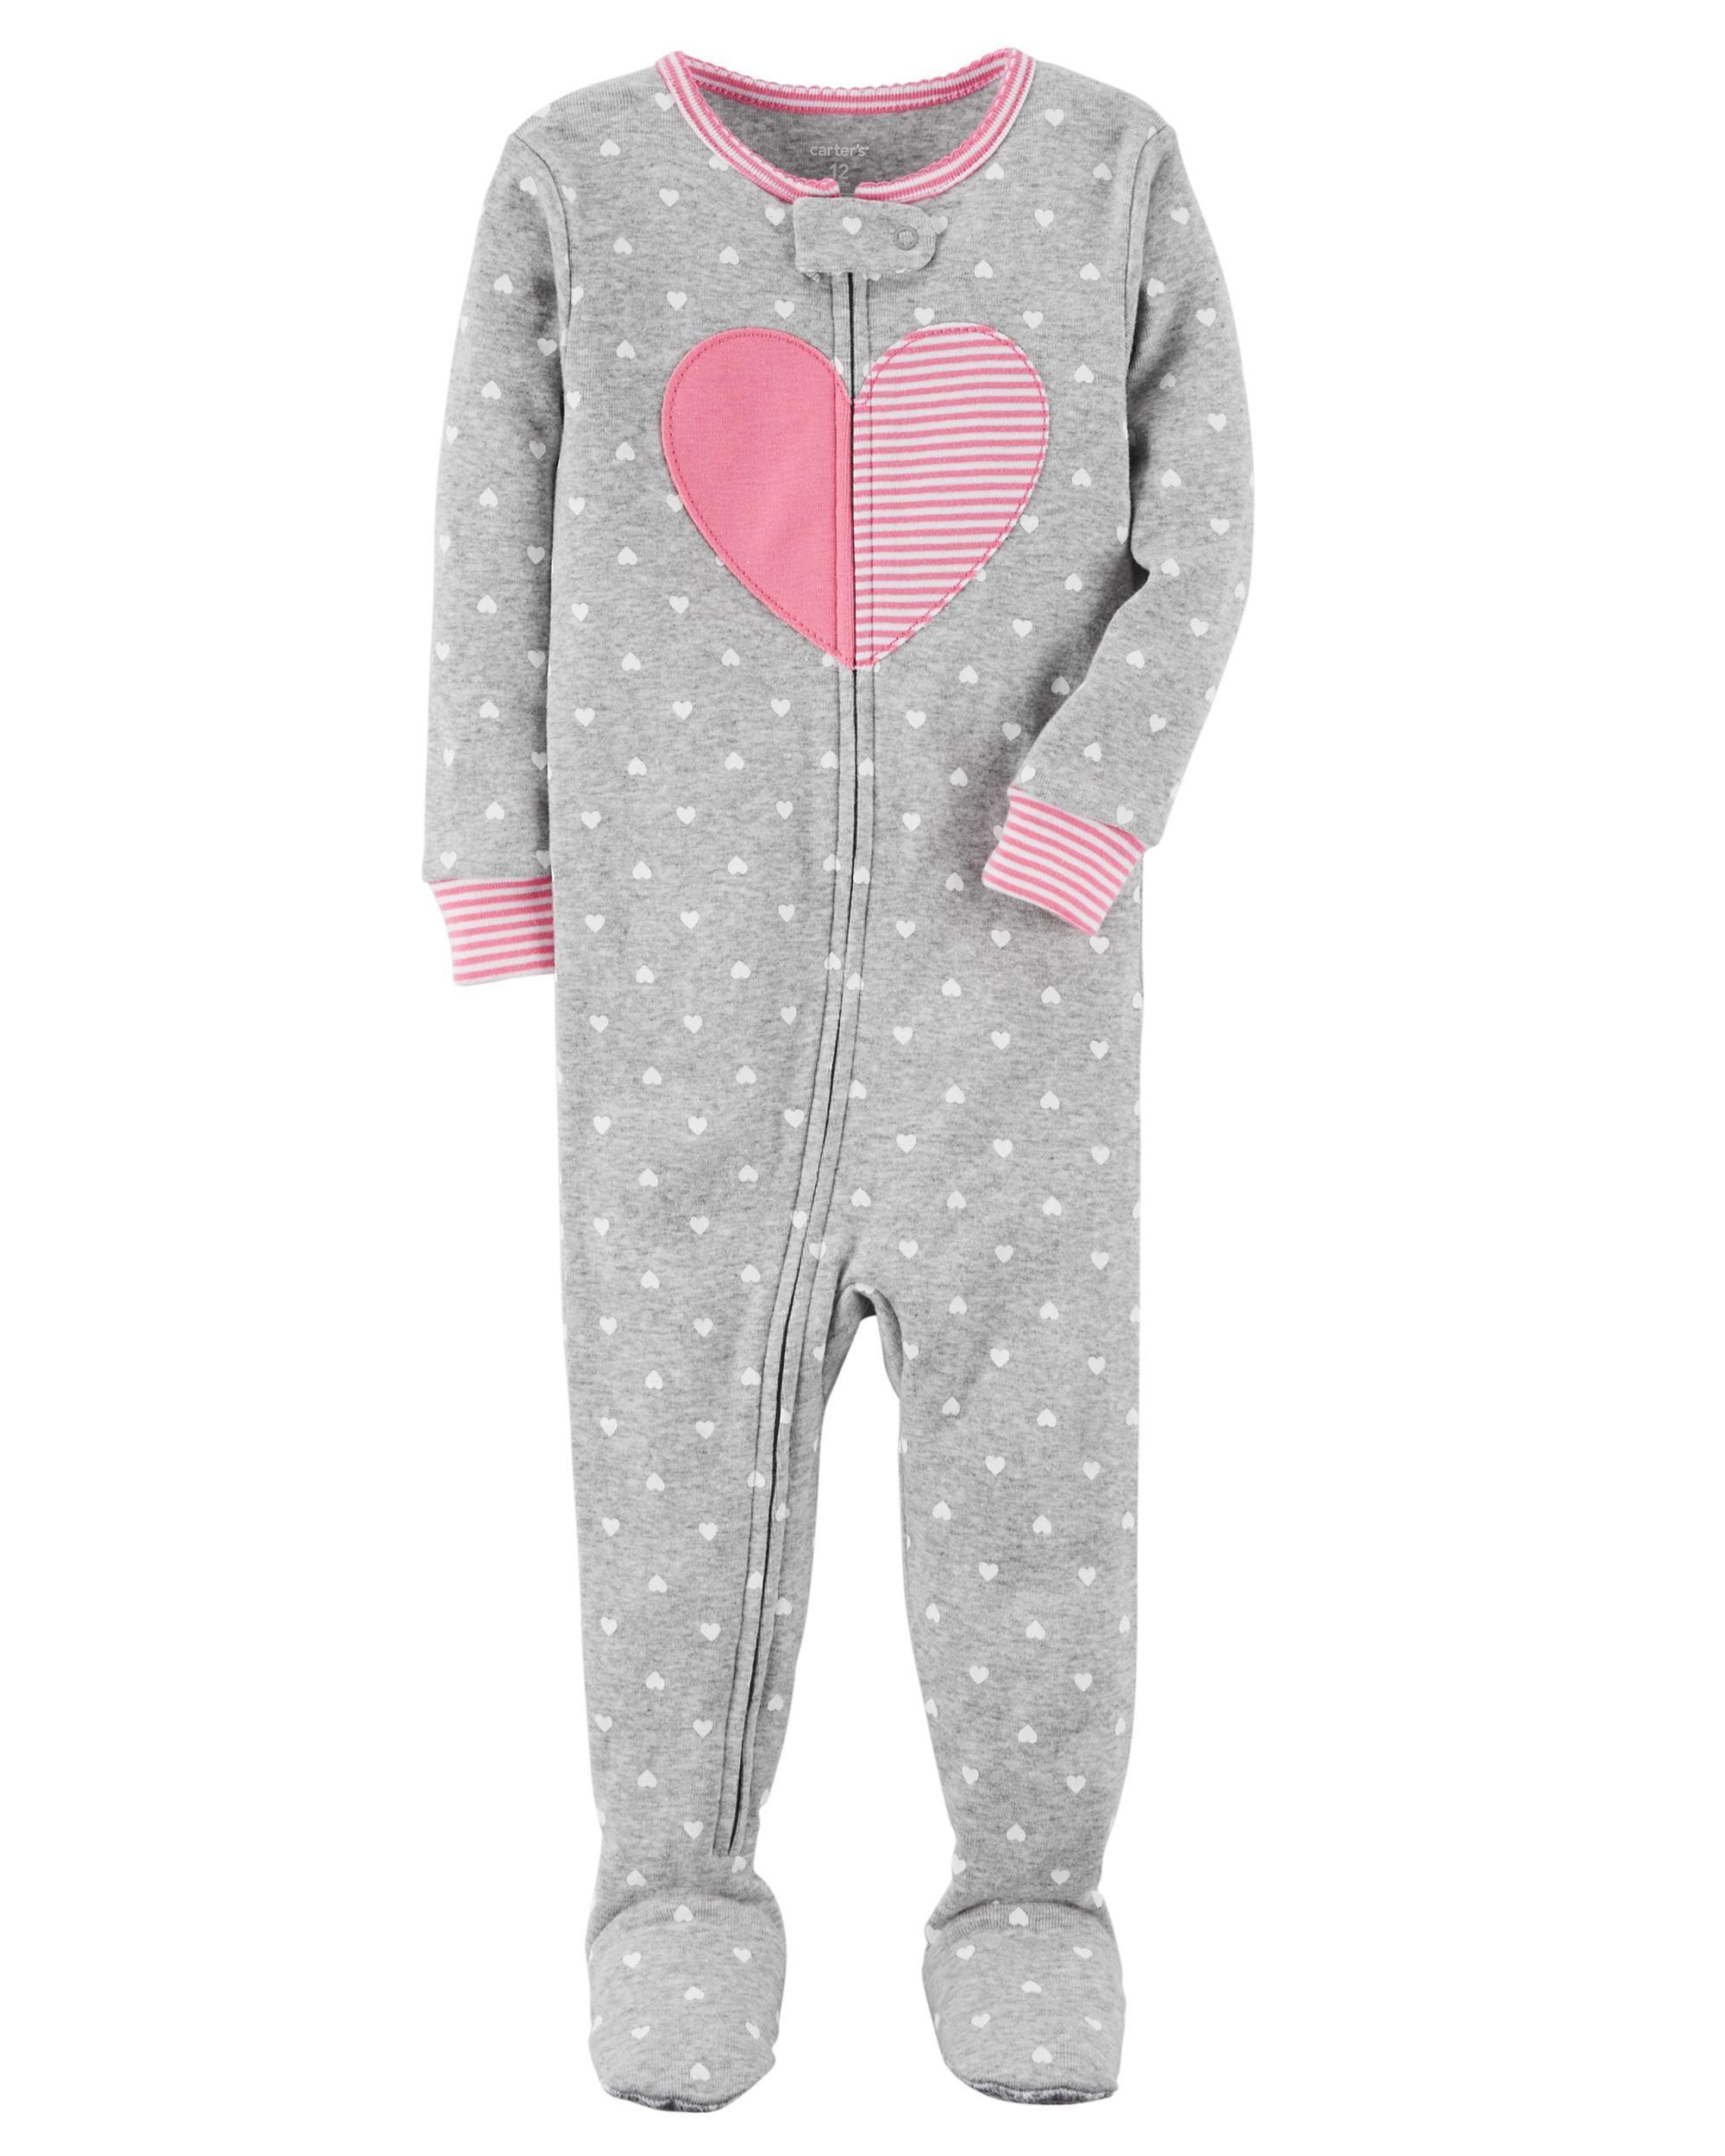 3577ce4fe 1-Piece Heart Snug Fit Cotton PJs